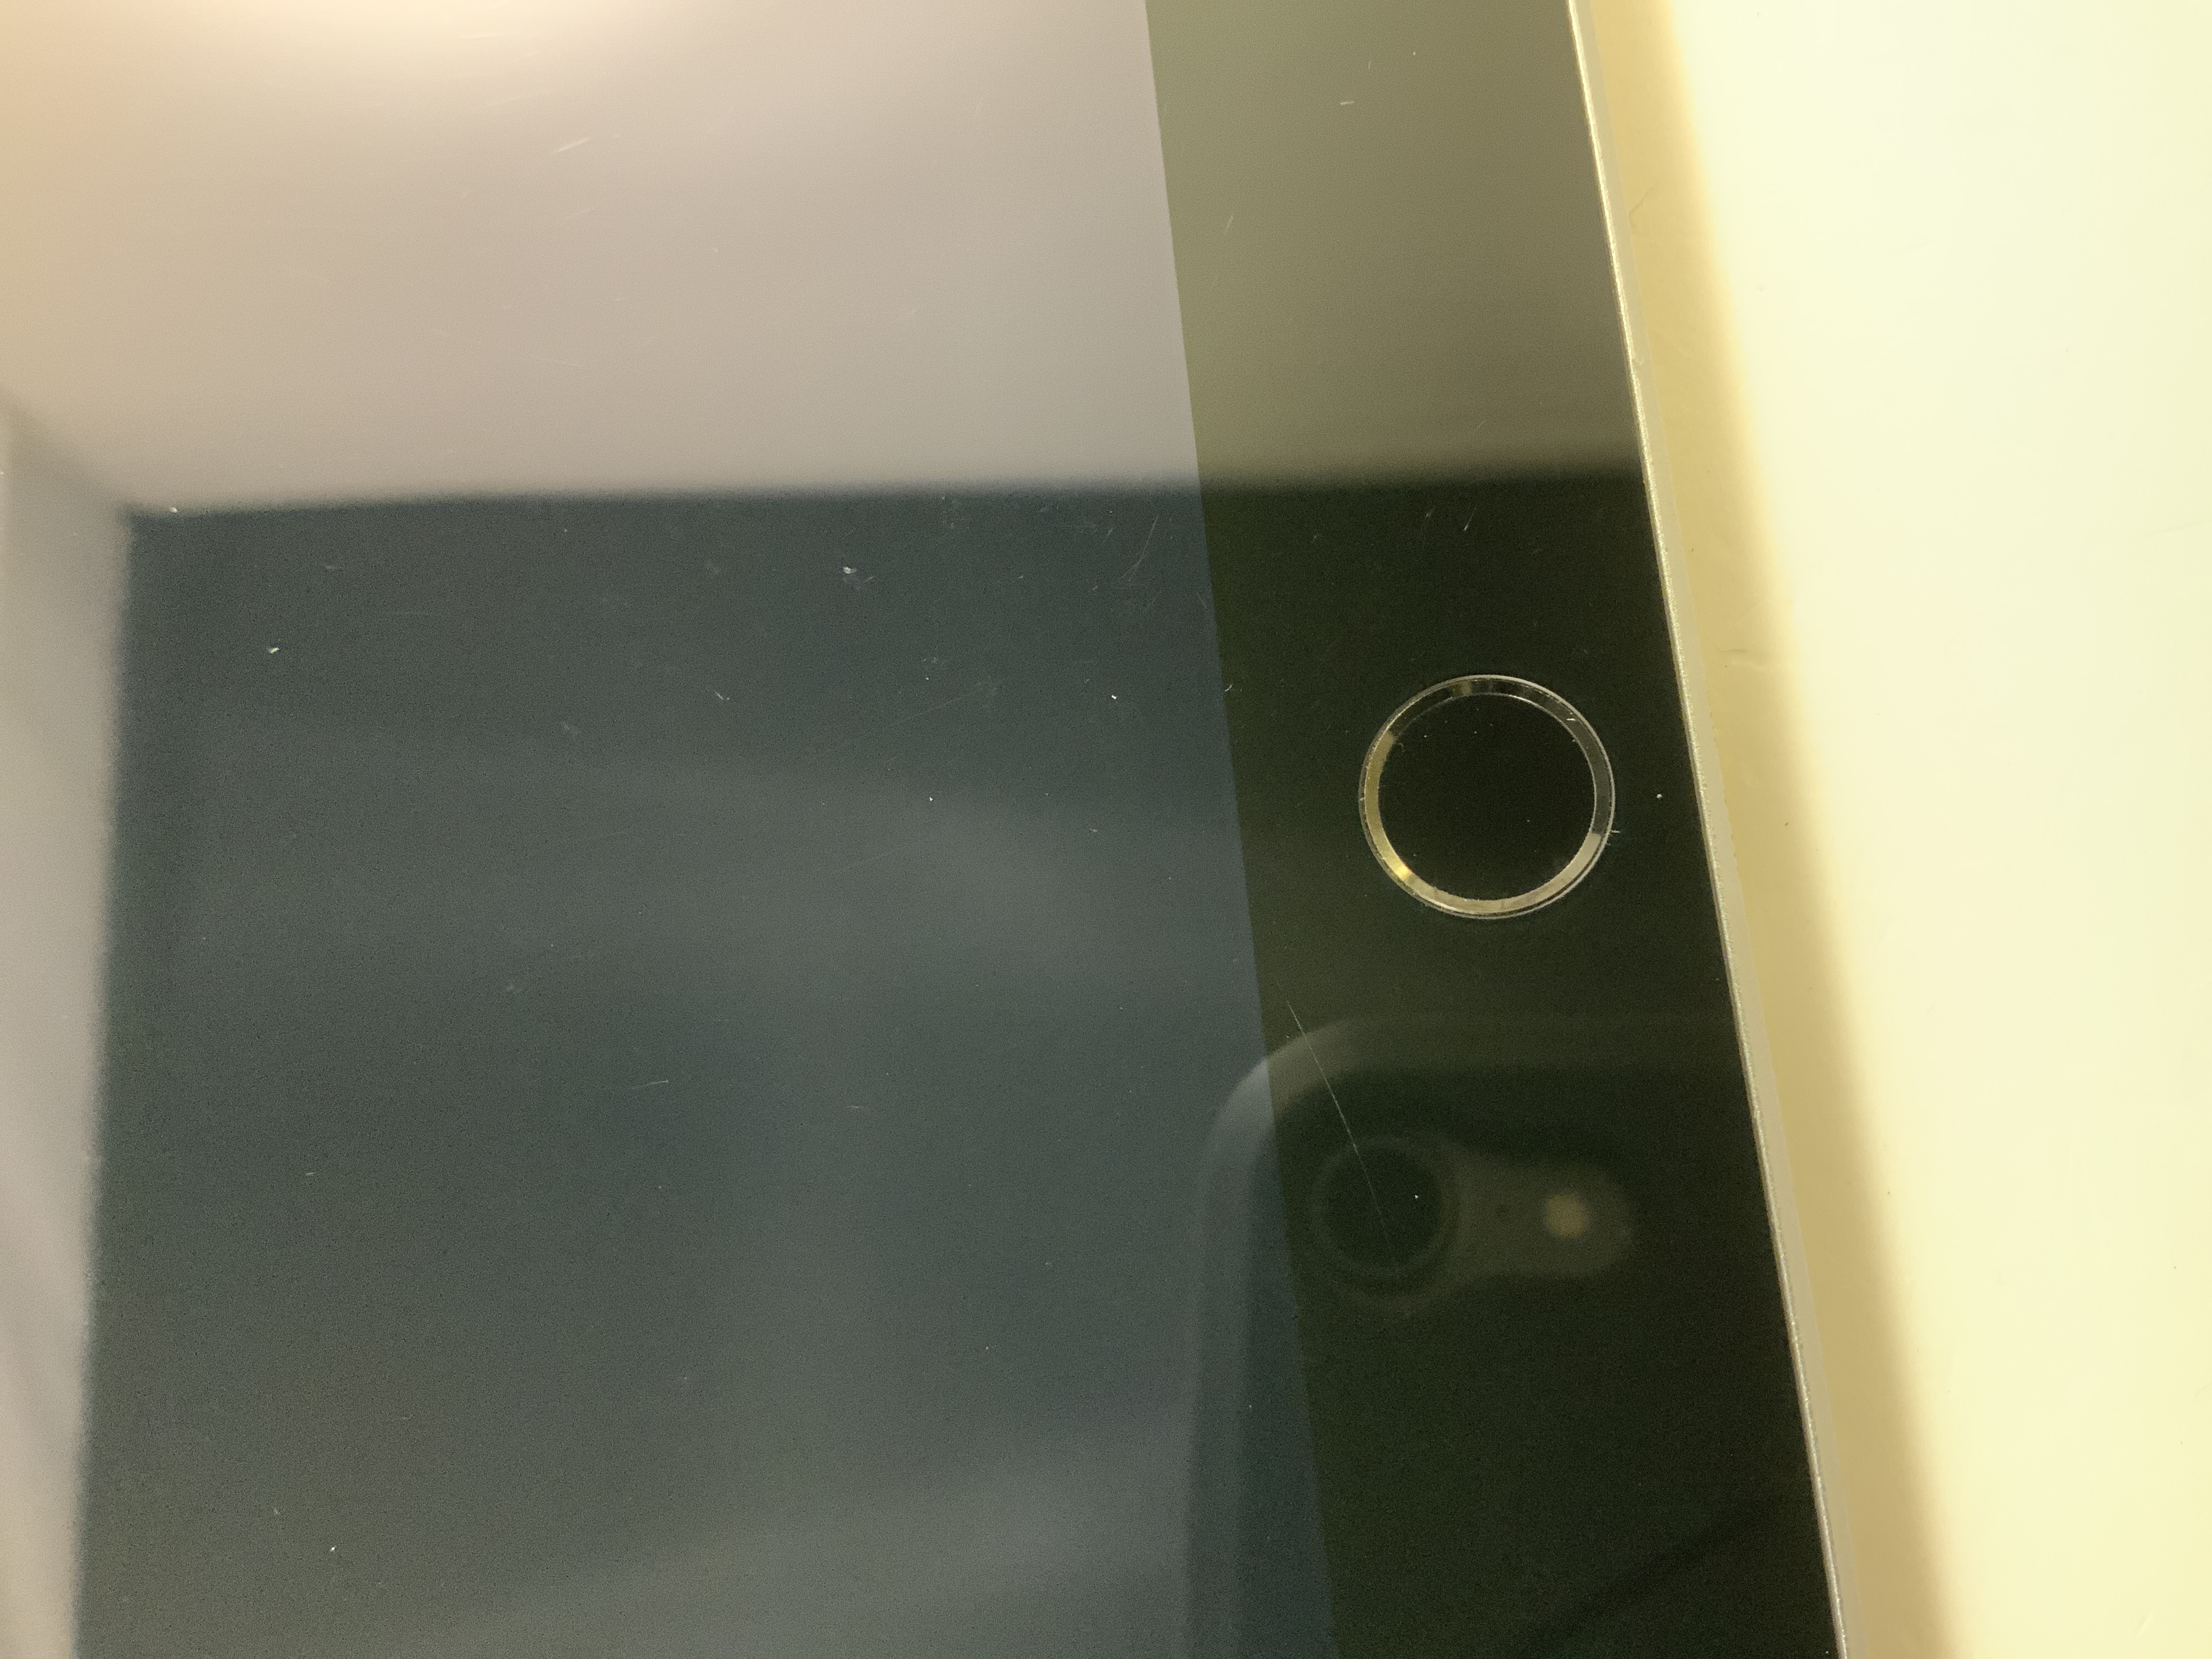 iPad 5 Wi-Fi + Cellular 128GB, 128GB, Space Gray, Kuva 5